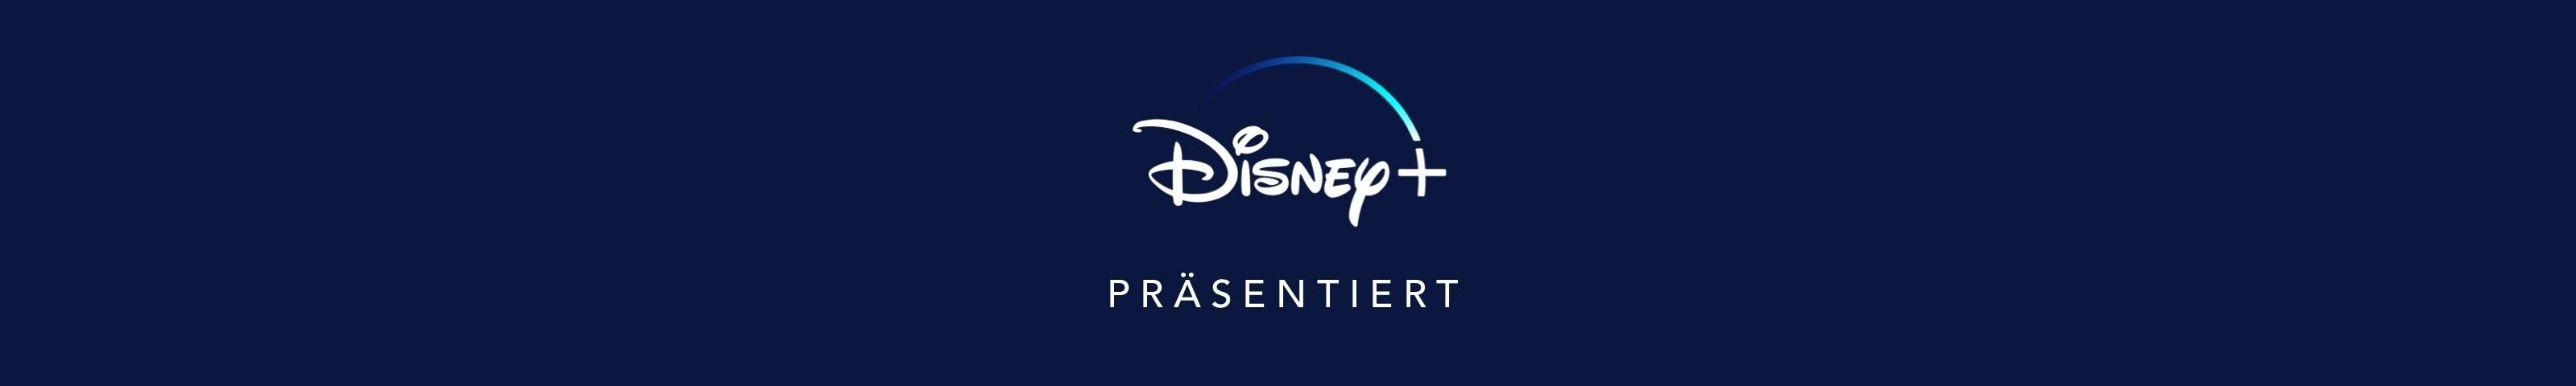 Disney+ präsentiert